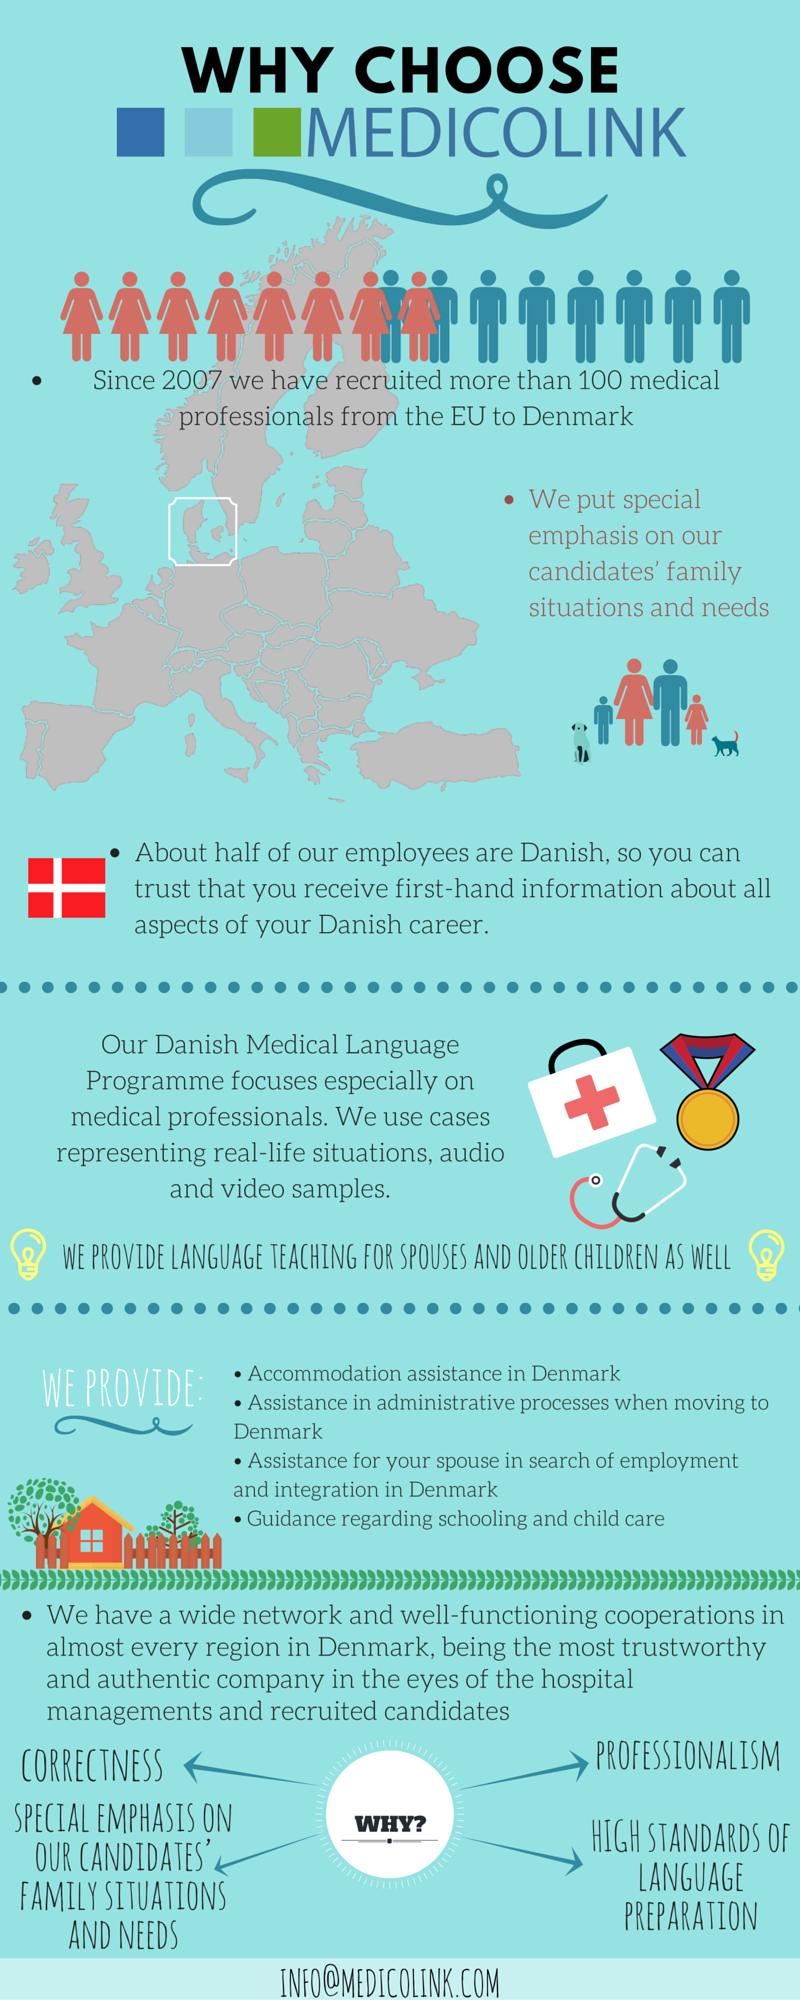 medicolink infographics about medical job opportunity in denmark in scandinavia